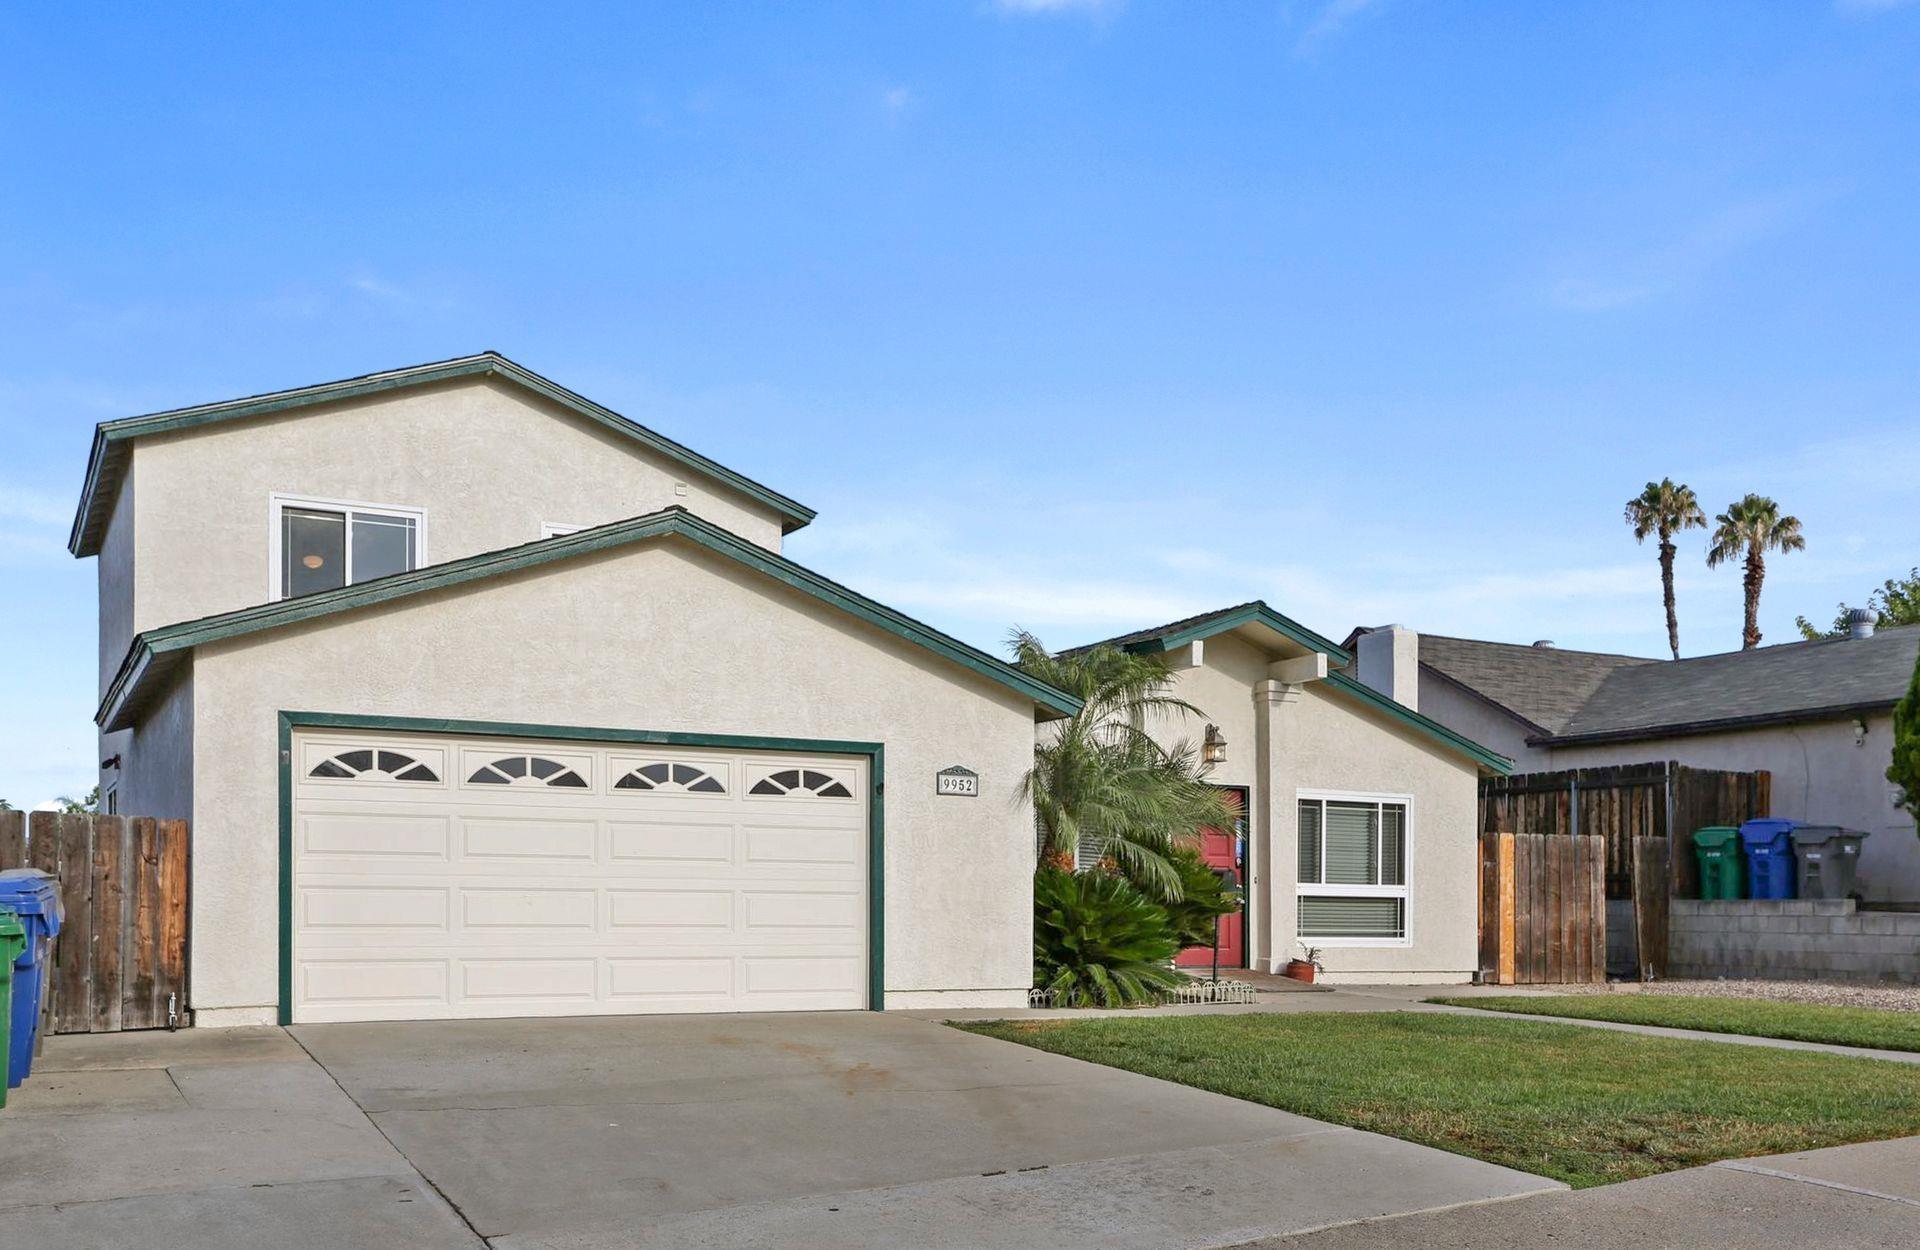 9952 Jeremy St, Santee, CA 92071